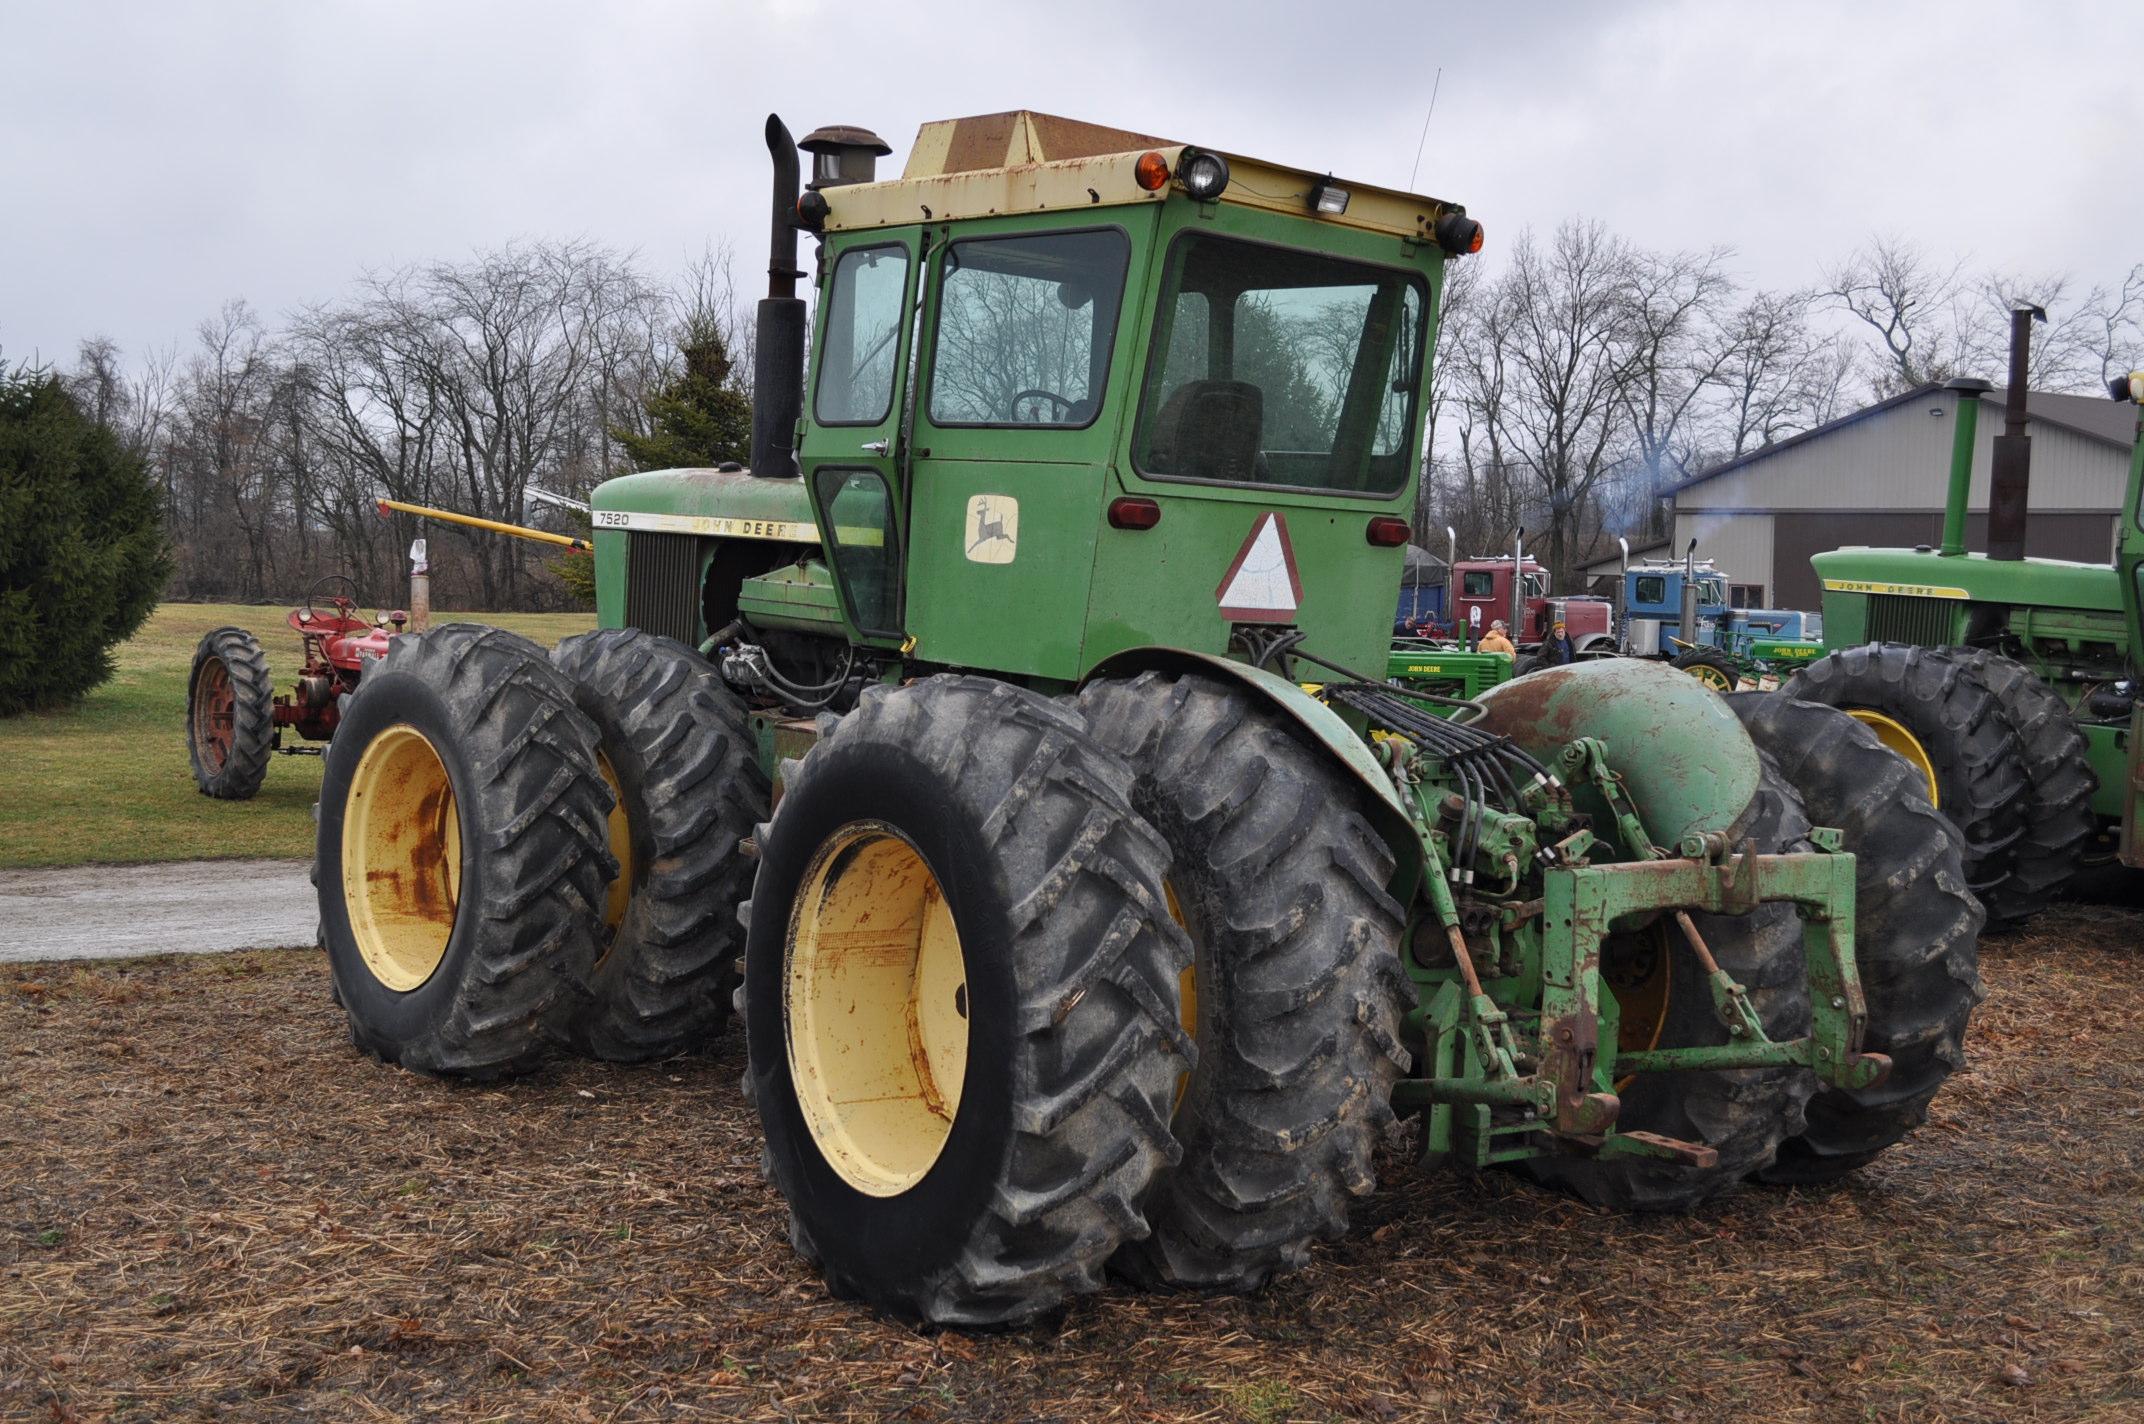 John Deere 7520 tractor, 4WD, diesel, 18.4-34 duals, original fenders, CHA, cab interior kit, 3 - Image 2 of 24